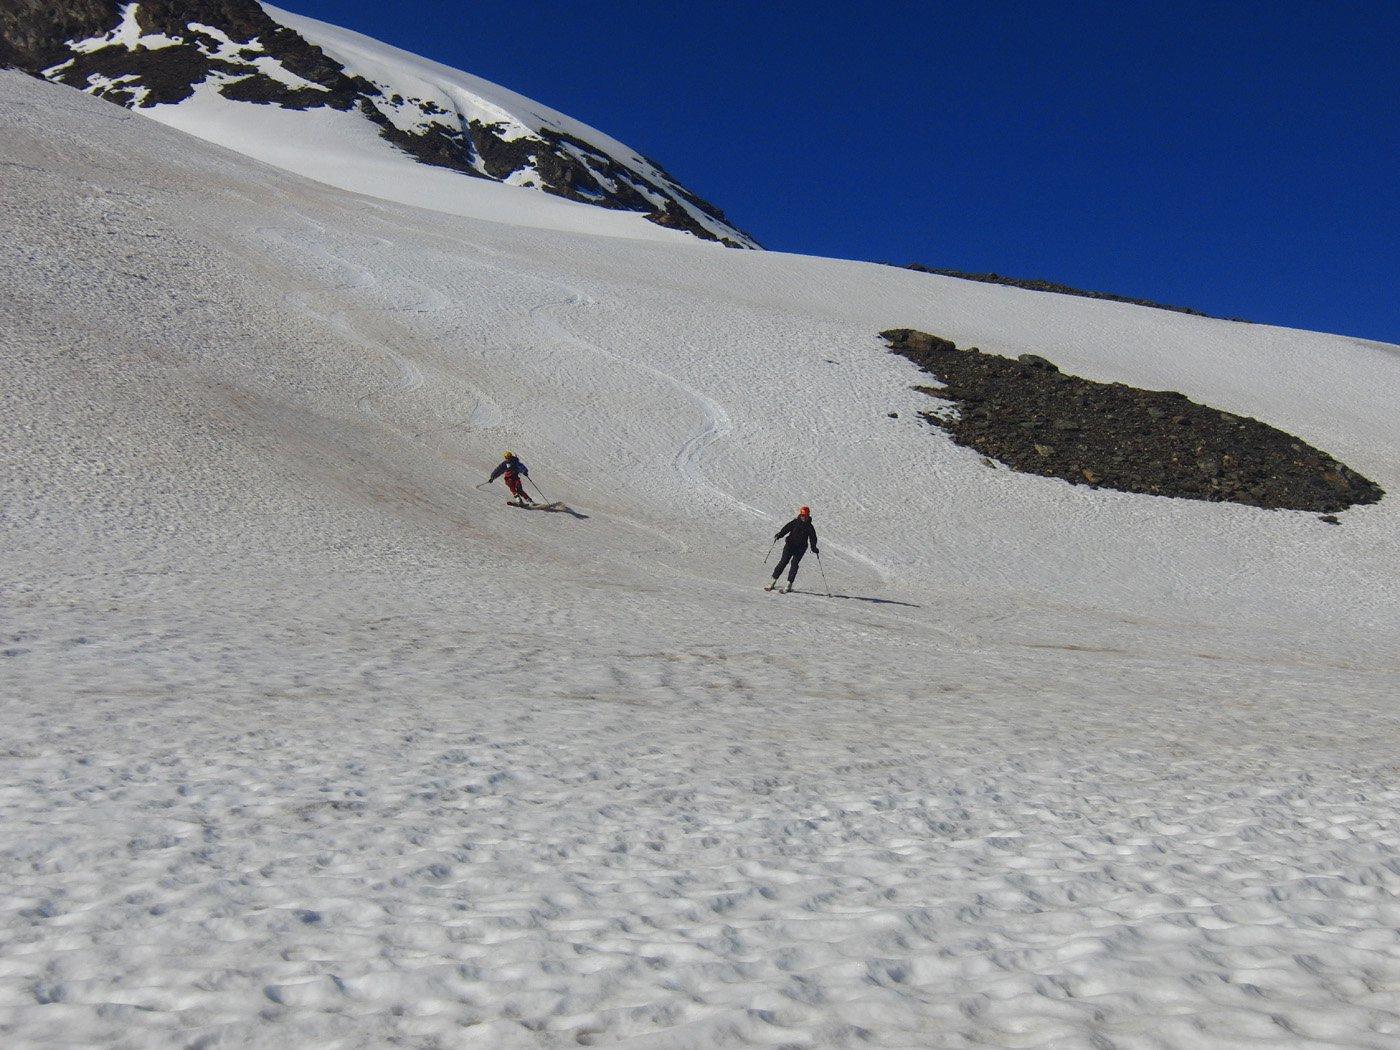 Iseran (Signal de l') Anello Pont de la Neige-Col de l'Iseran-Col Pers 2016-06-25